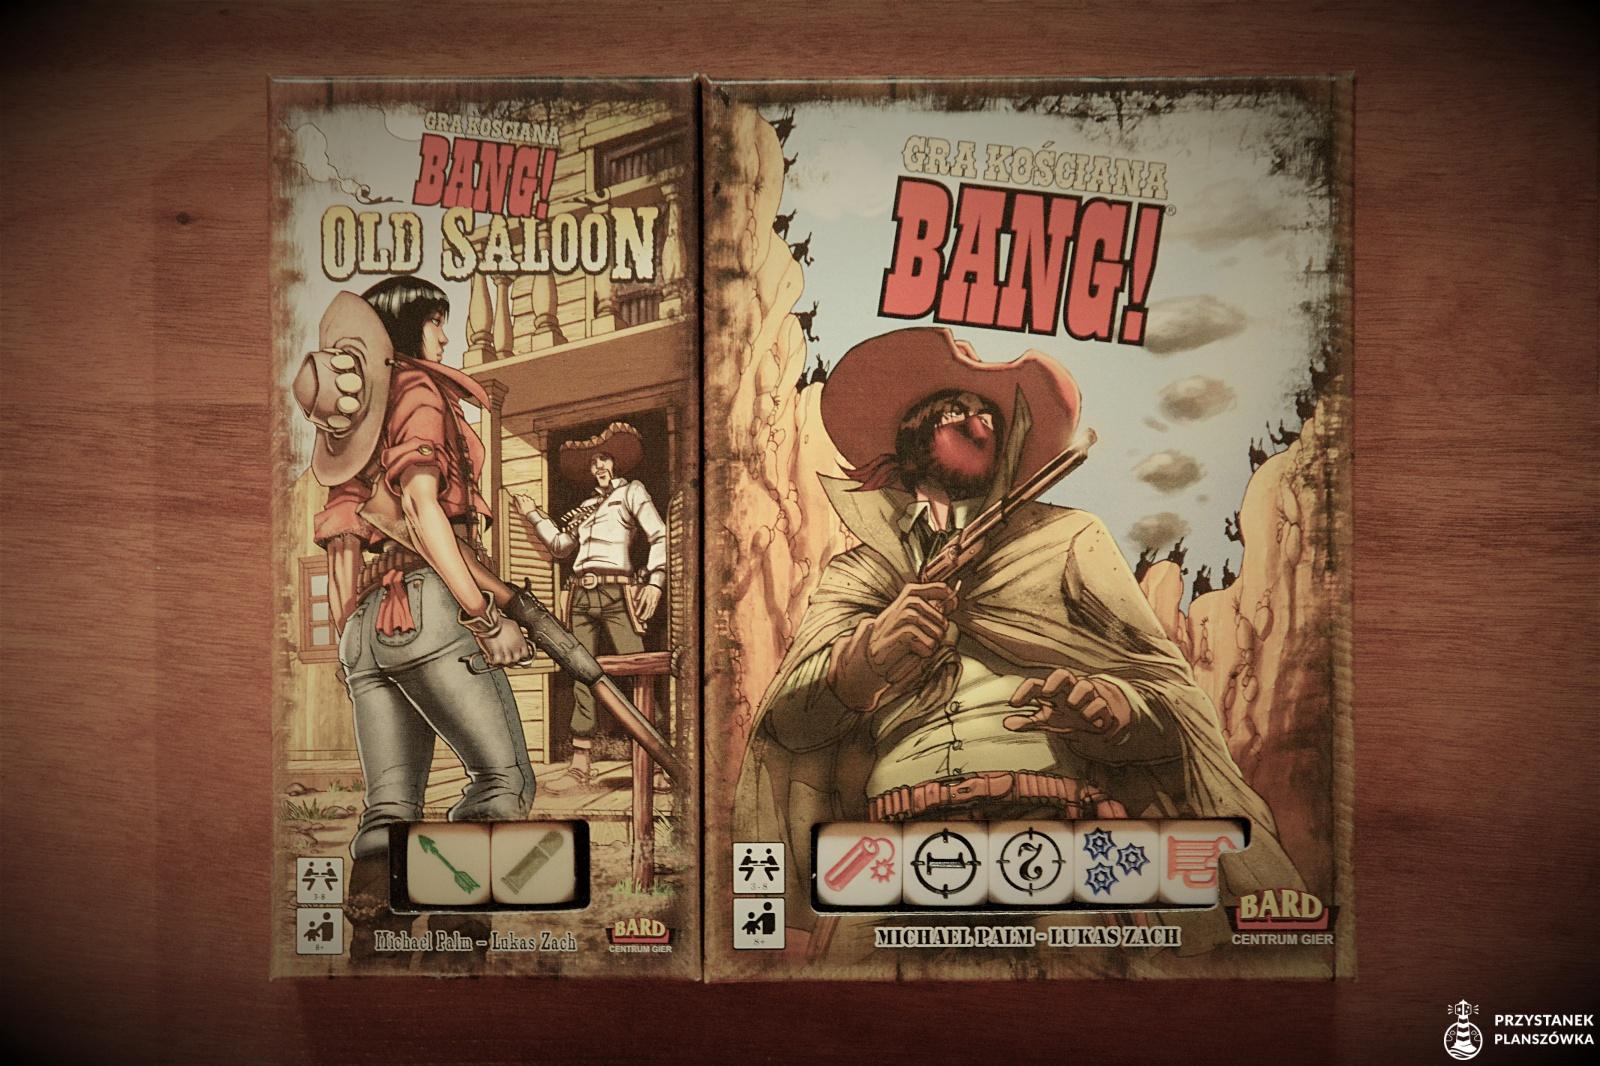 Bang! Gra kościana i Old Saloon